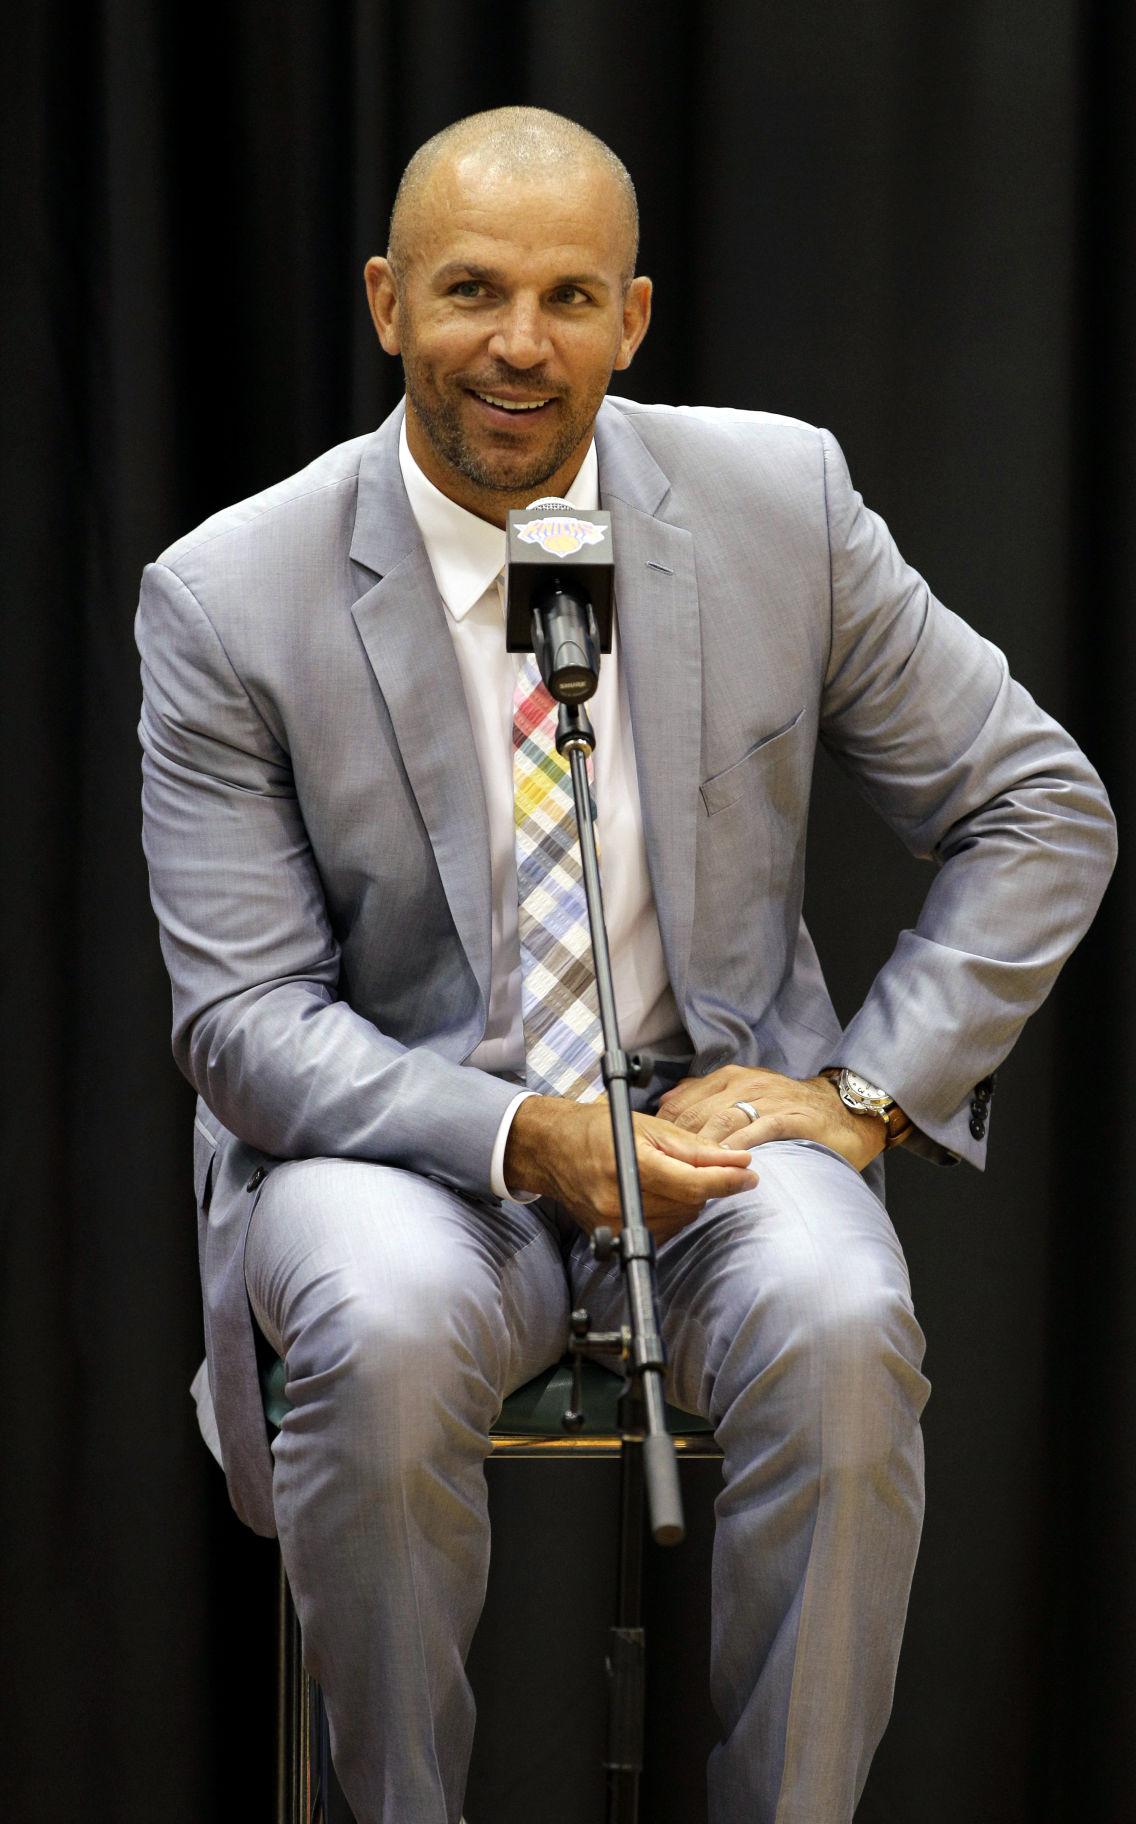 N.Y. Knicks' Jason Kidd arrested on DWI charge in Hamptons